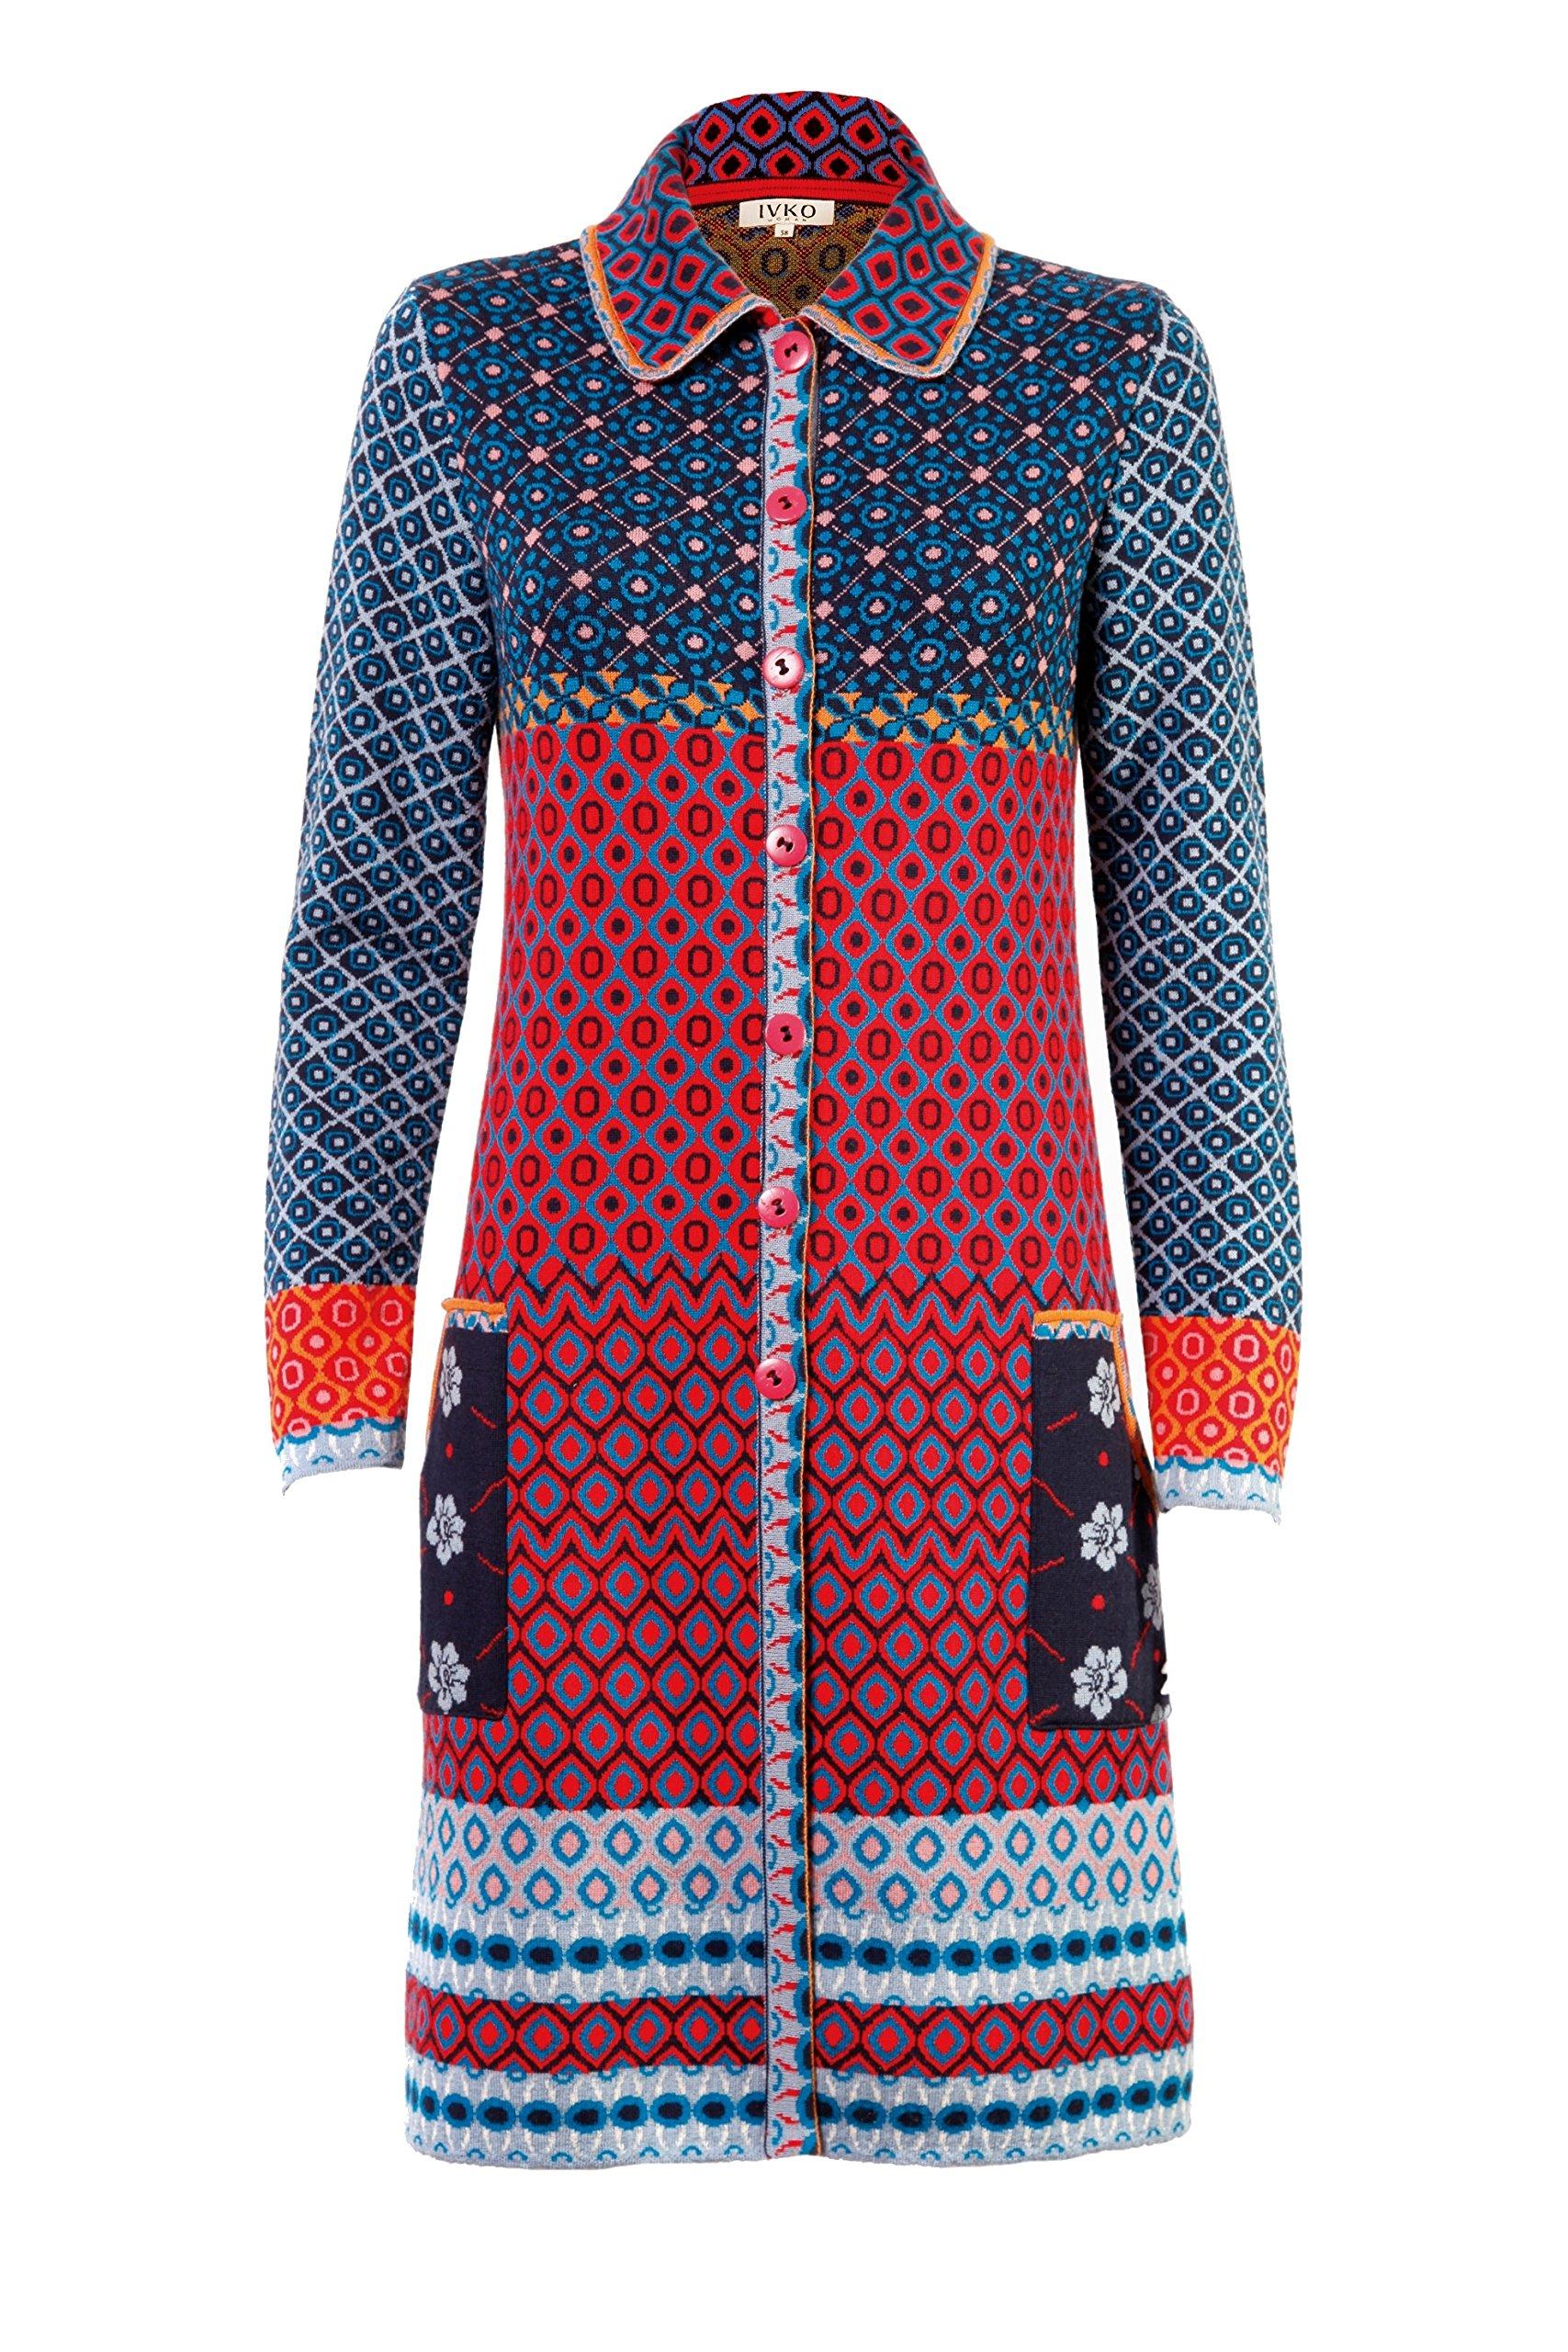 IVKO Long Merino Wool Sweater Jacket, Geometric Pattern, Front Button Closure, Blue/Red, US 8 - EUR 38